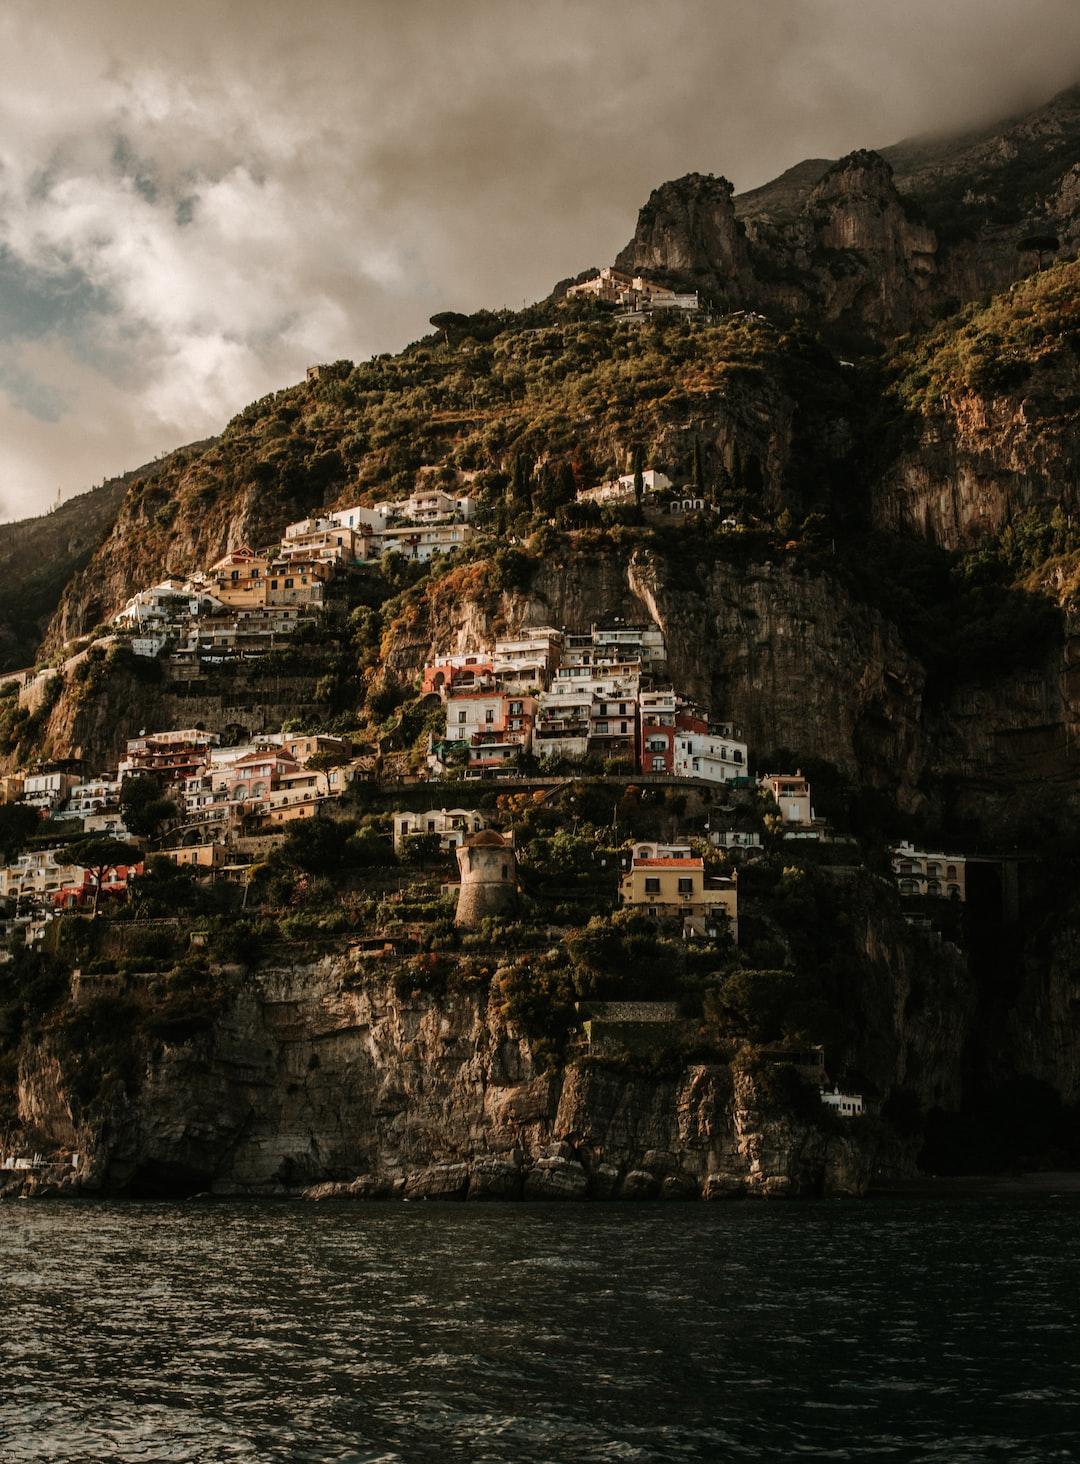 Colorful Amalfi